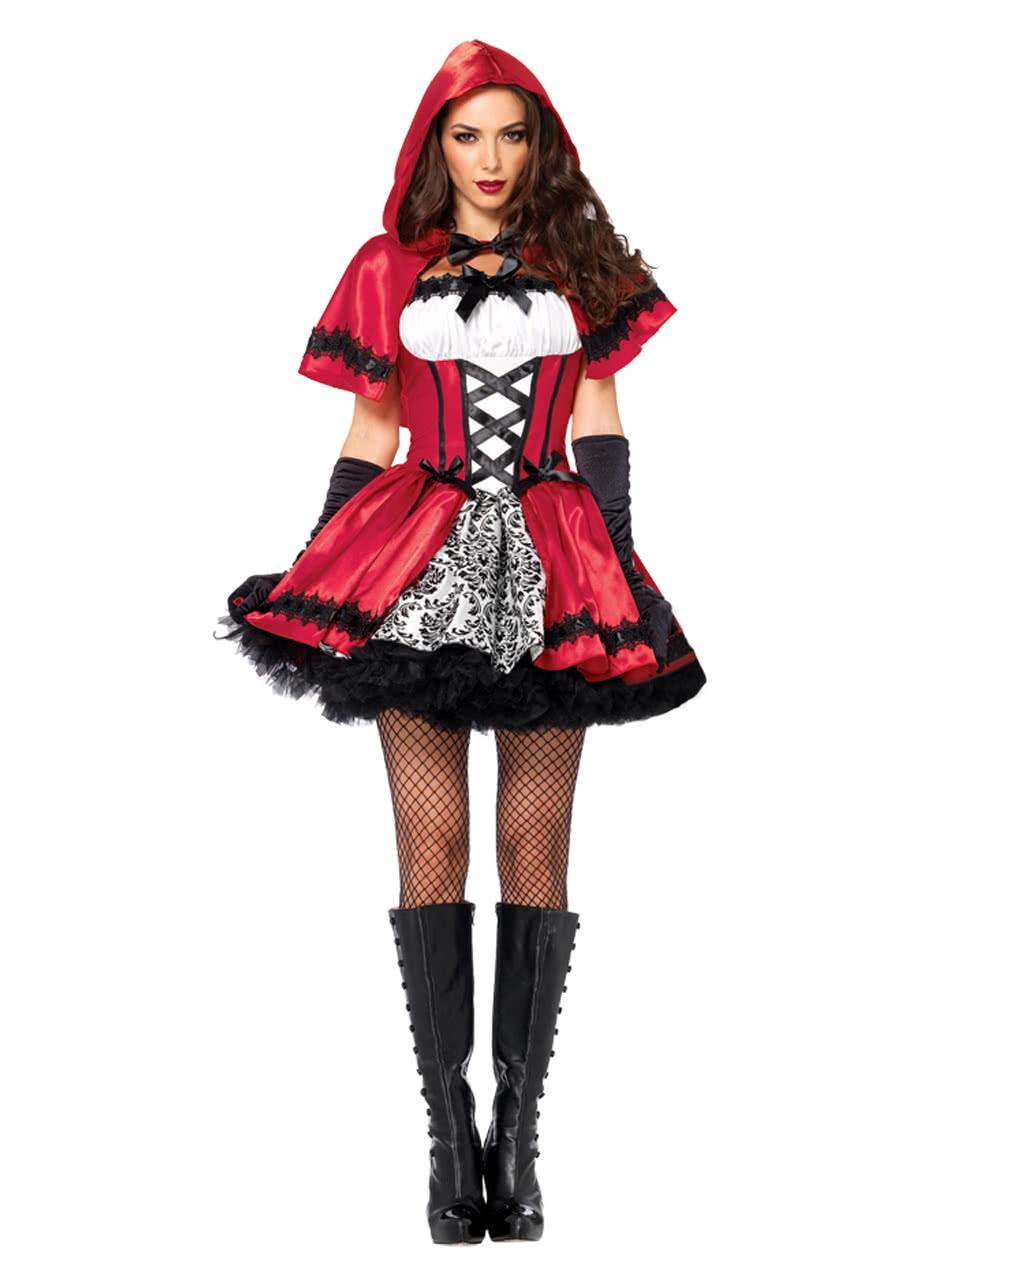 Dusteres Rotkappchen Kostum Fur Fasching Karneval Universe